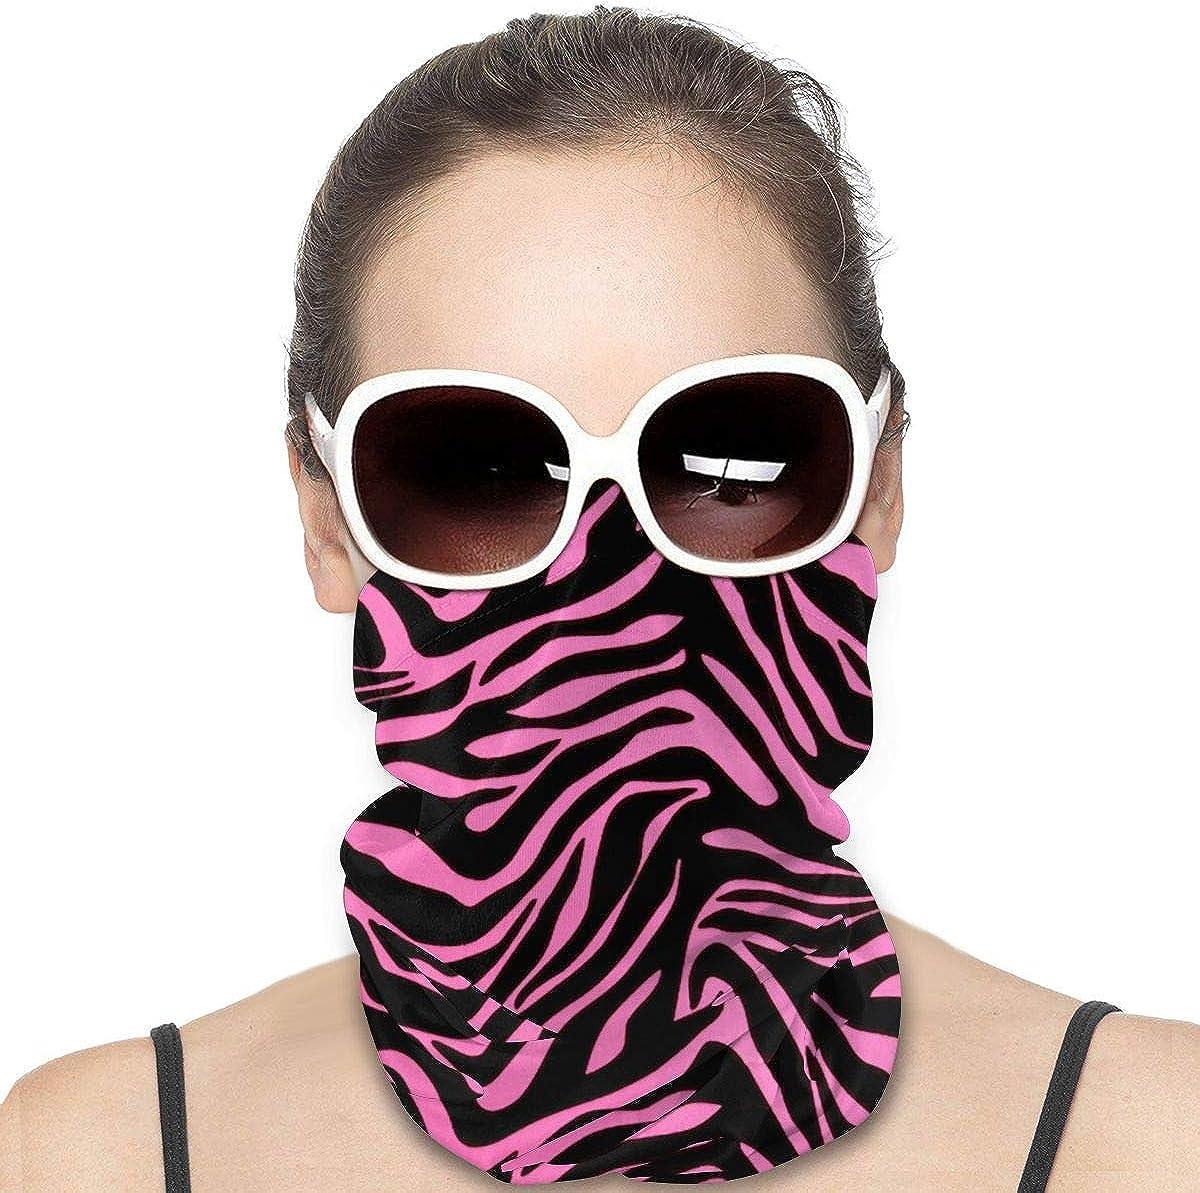 Tidyki Neck Gaiters for Men - Pink and Black Zebra Print Motorcycle Mask Neck Gaiter Multifunctional Headwear Head Bands Sport Mask Headband Face Mask Bandana